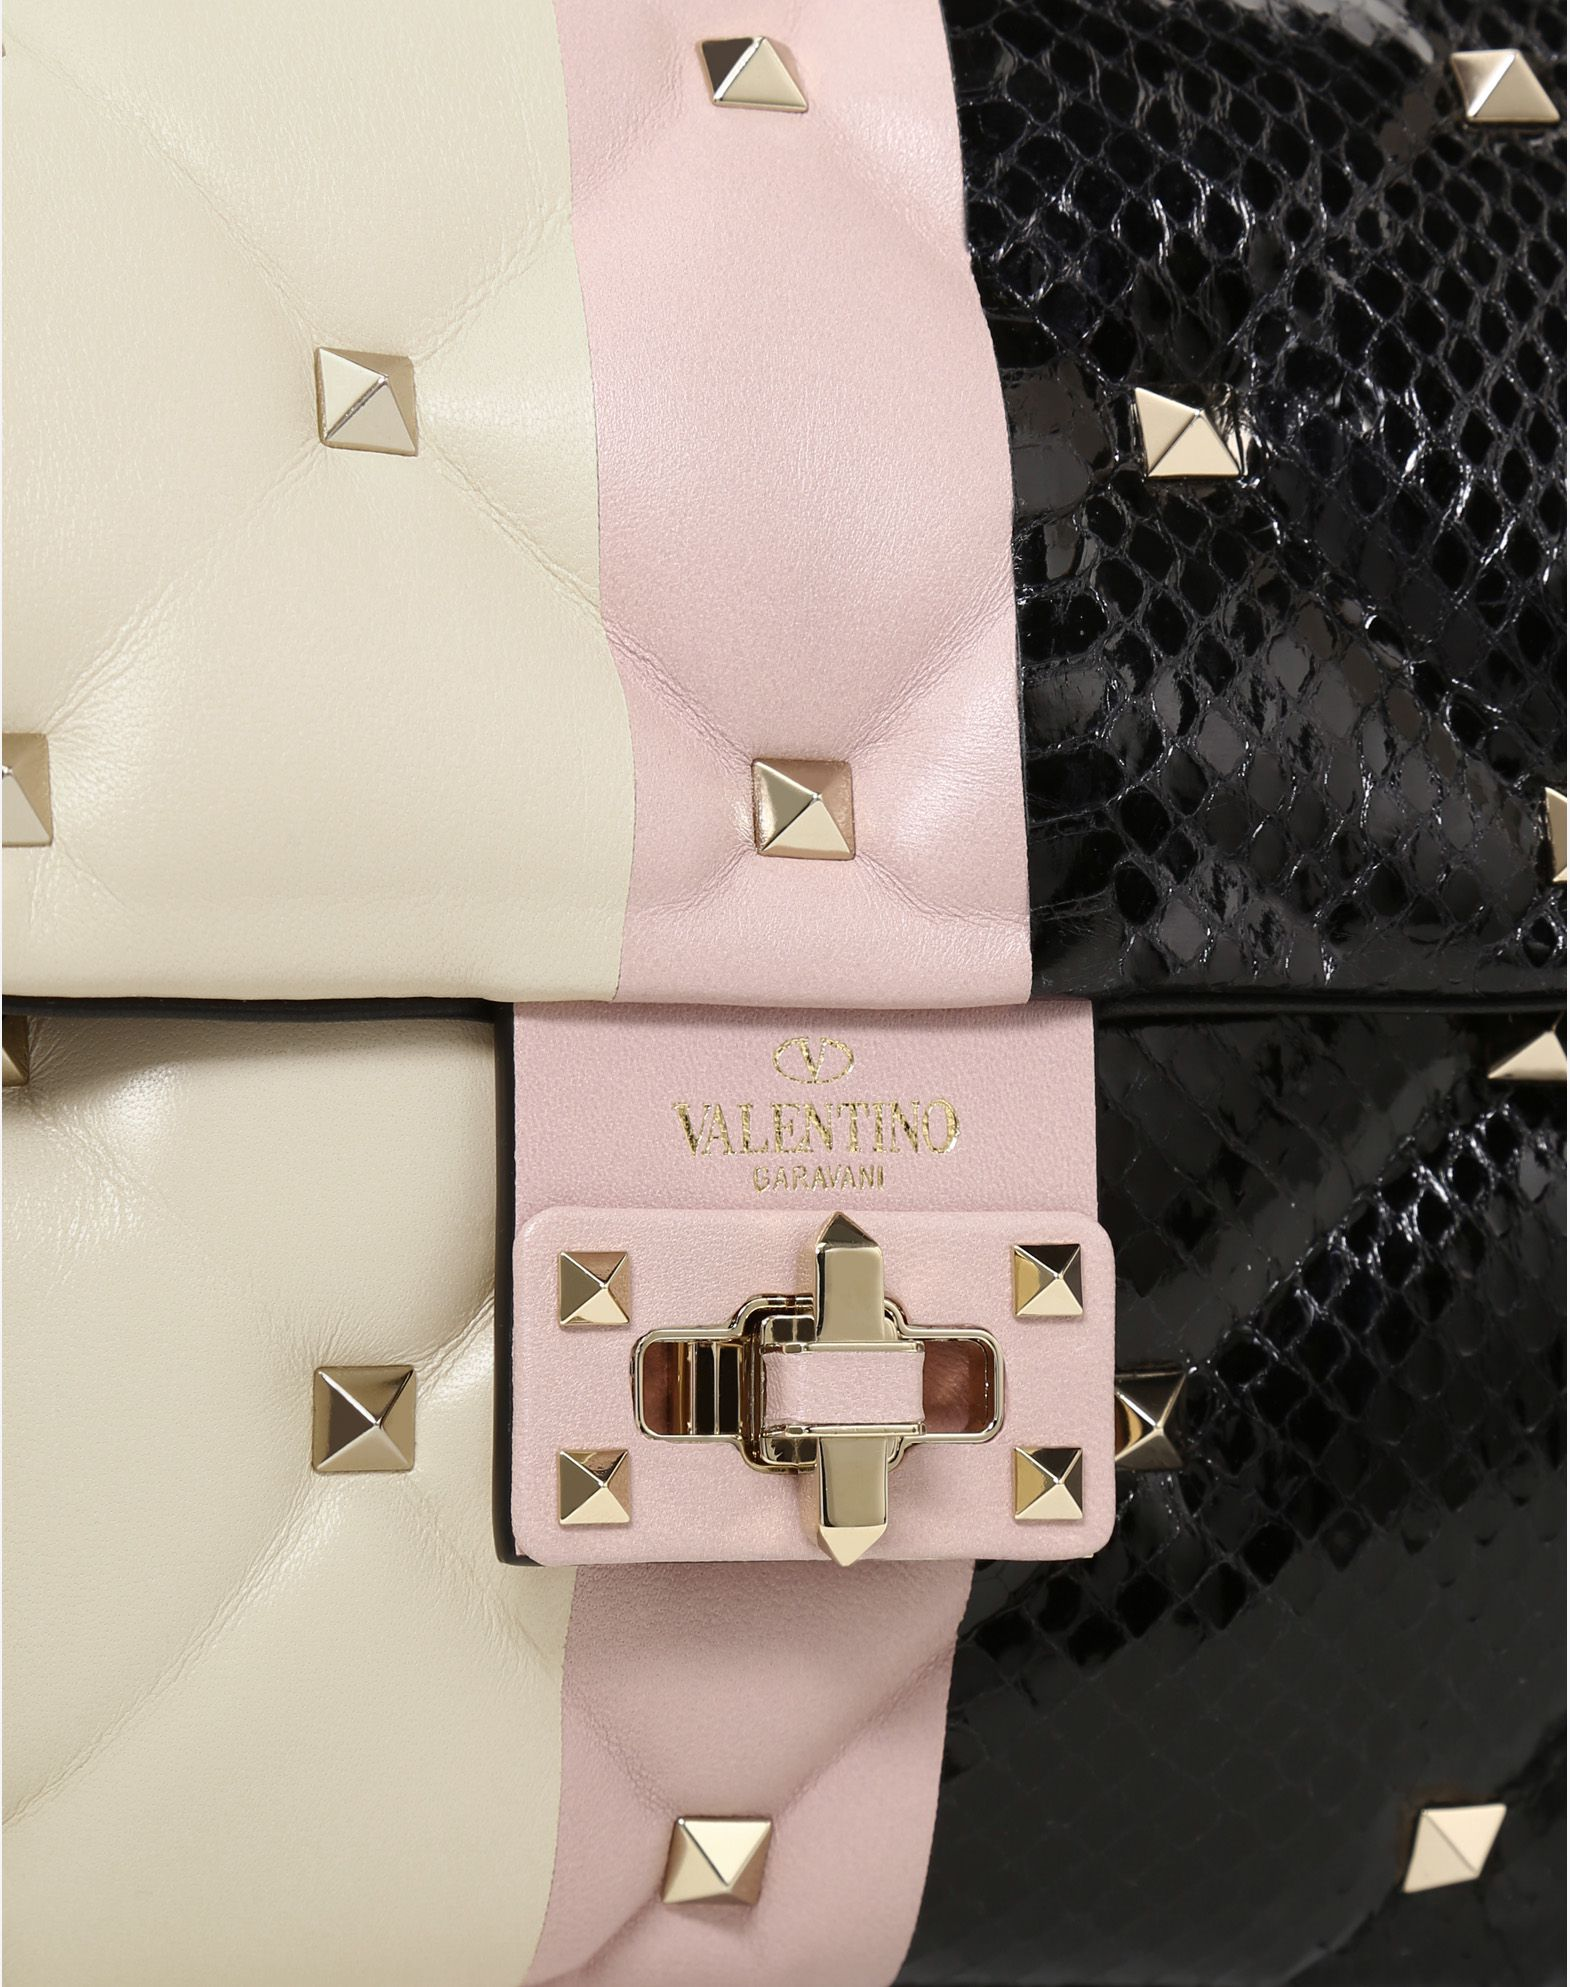 VALENTINO GARAVANI Candystud Cross-body Bag CROSS BODY BAG D b